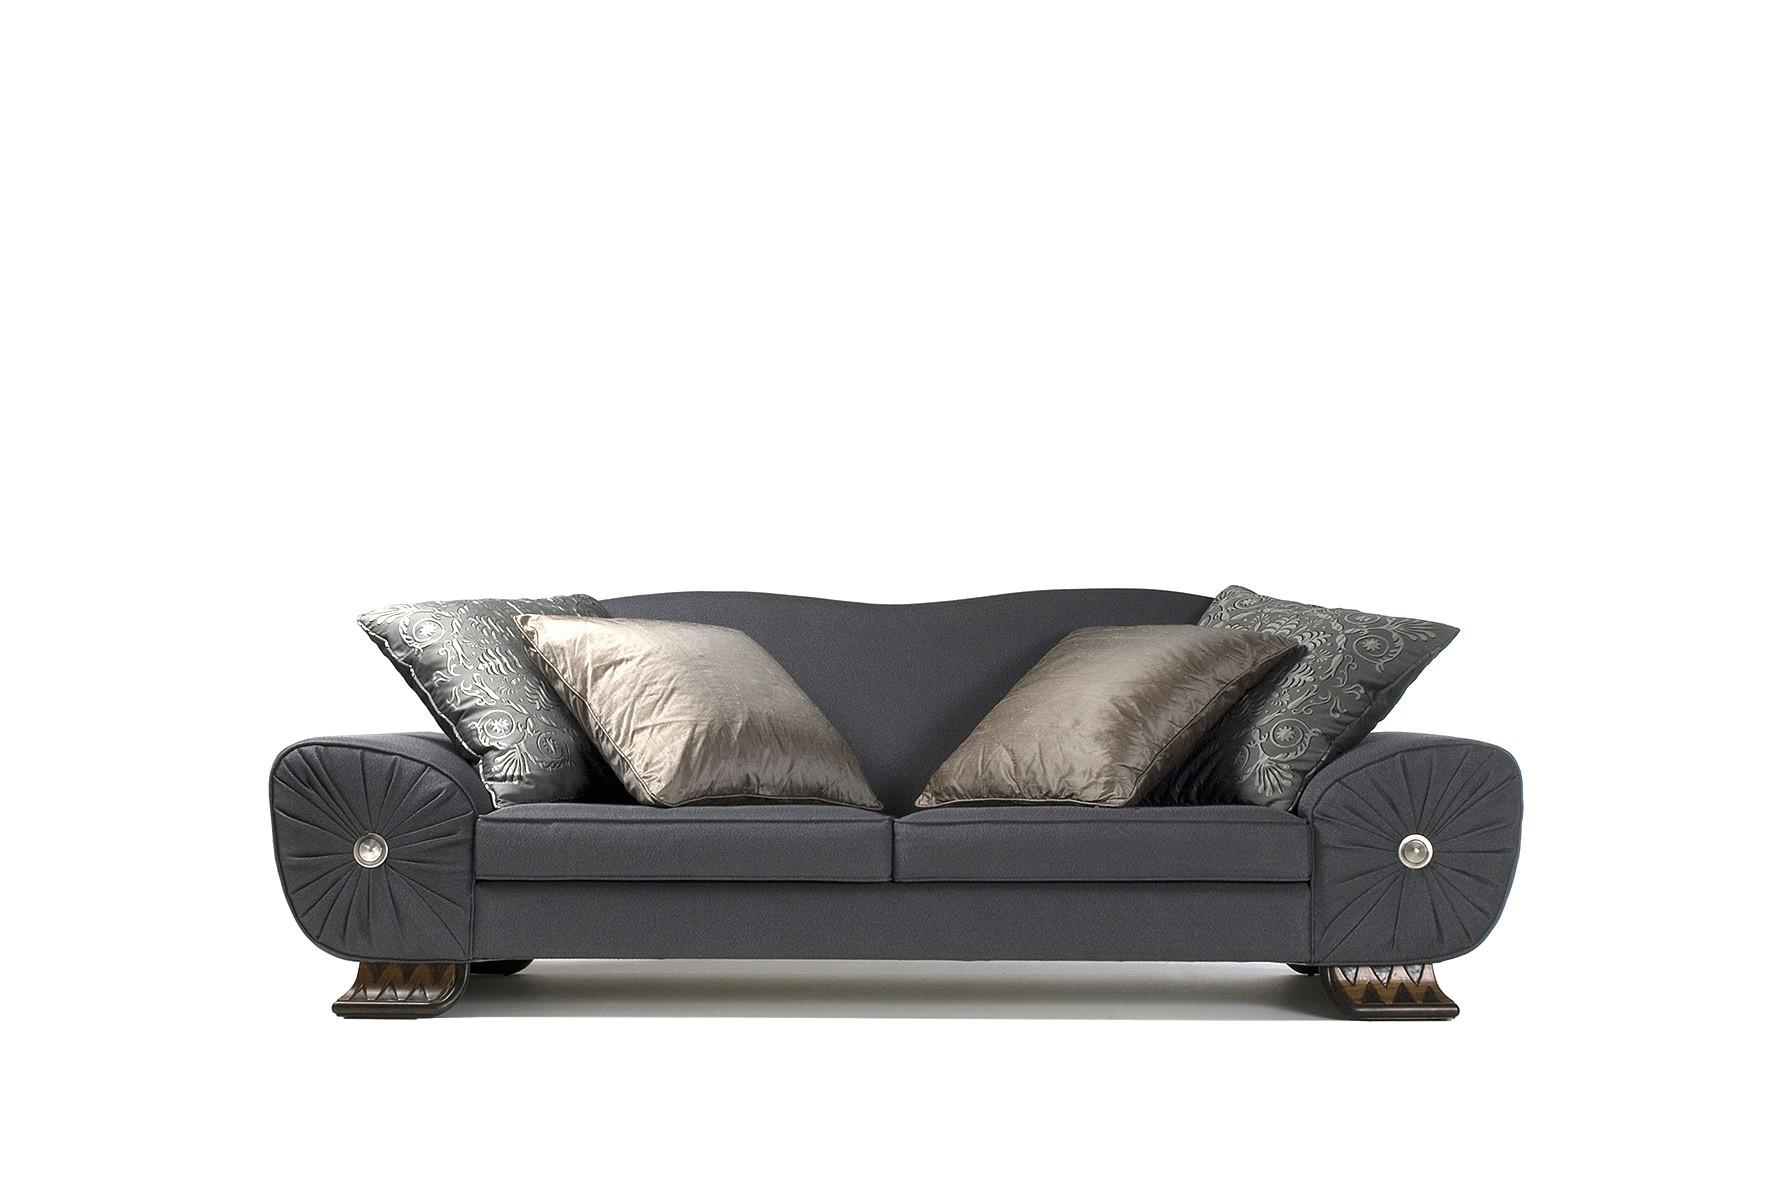 3 seater sofa throws uk charcoal gray covers felipe hadley rose